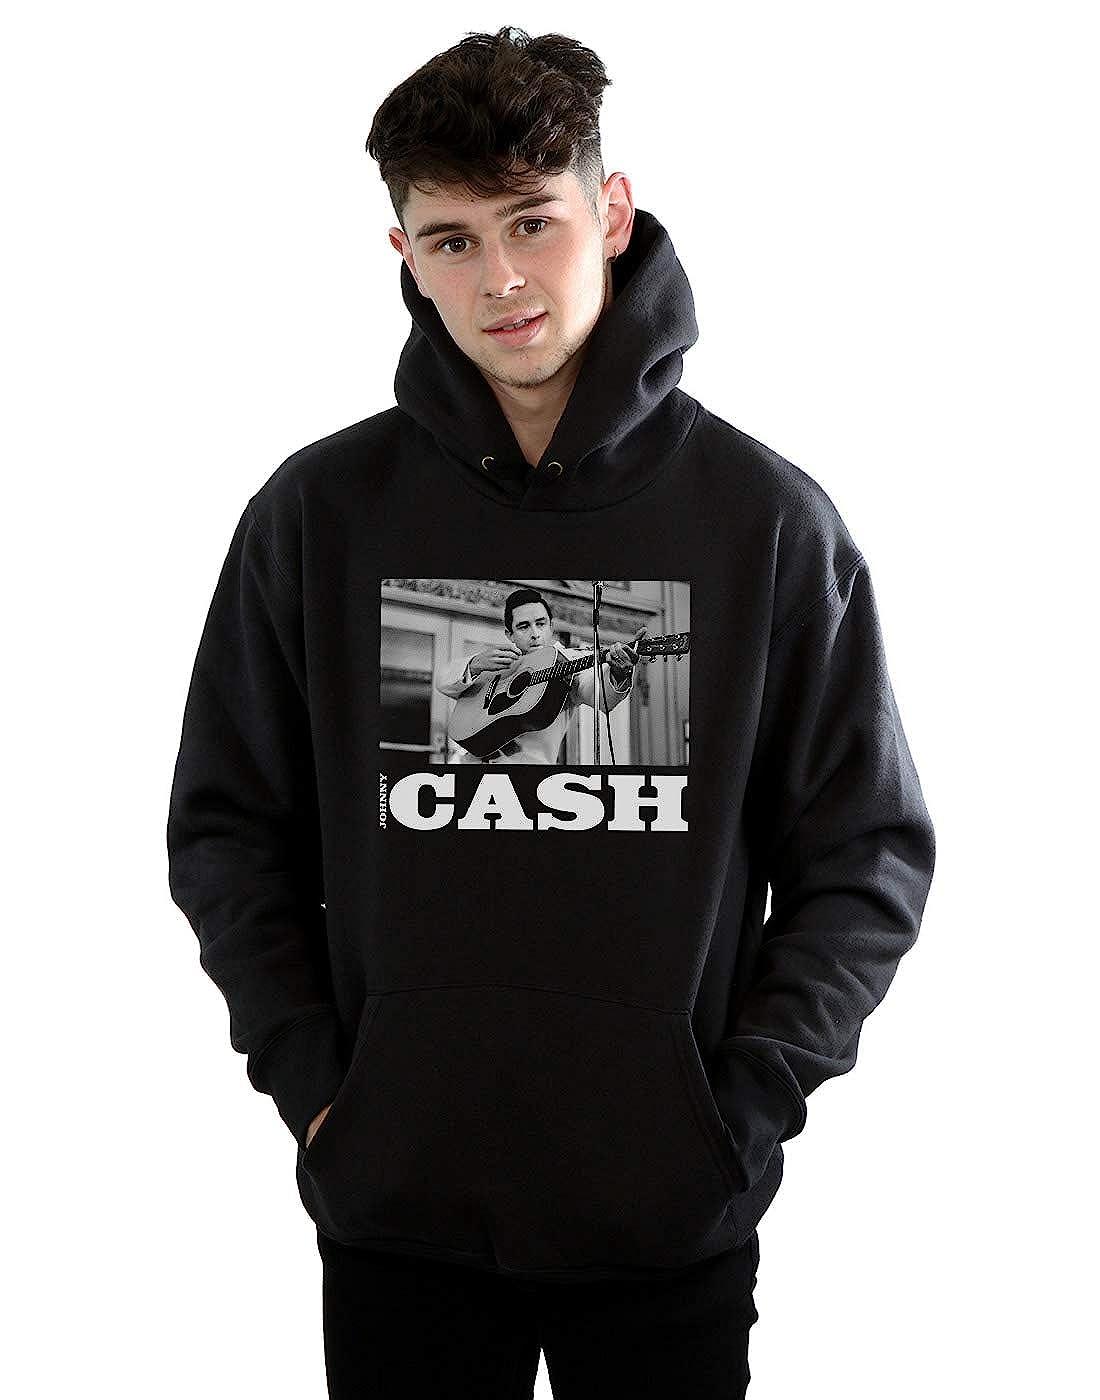 Absolute Cult Johnny Cash Mens Plays Guitar Hoodie